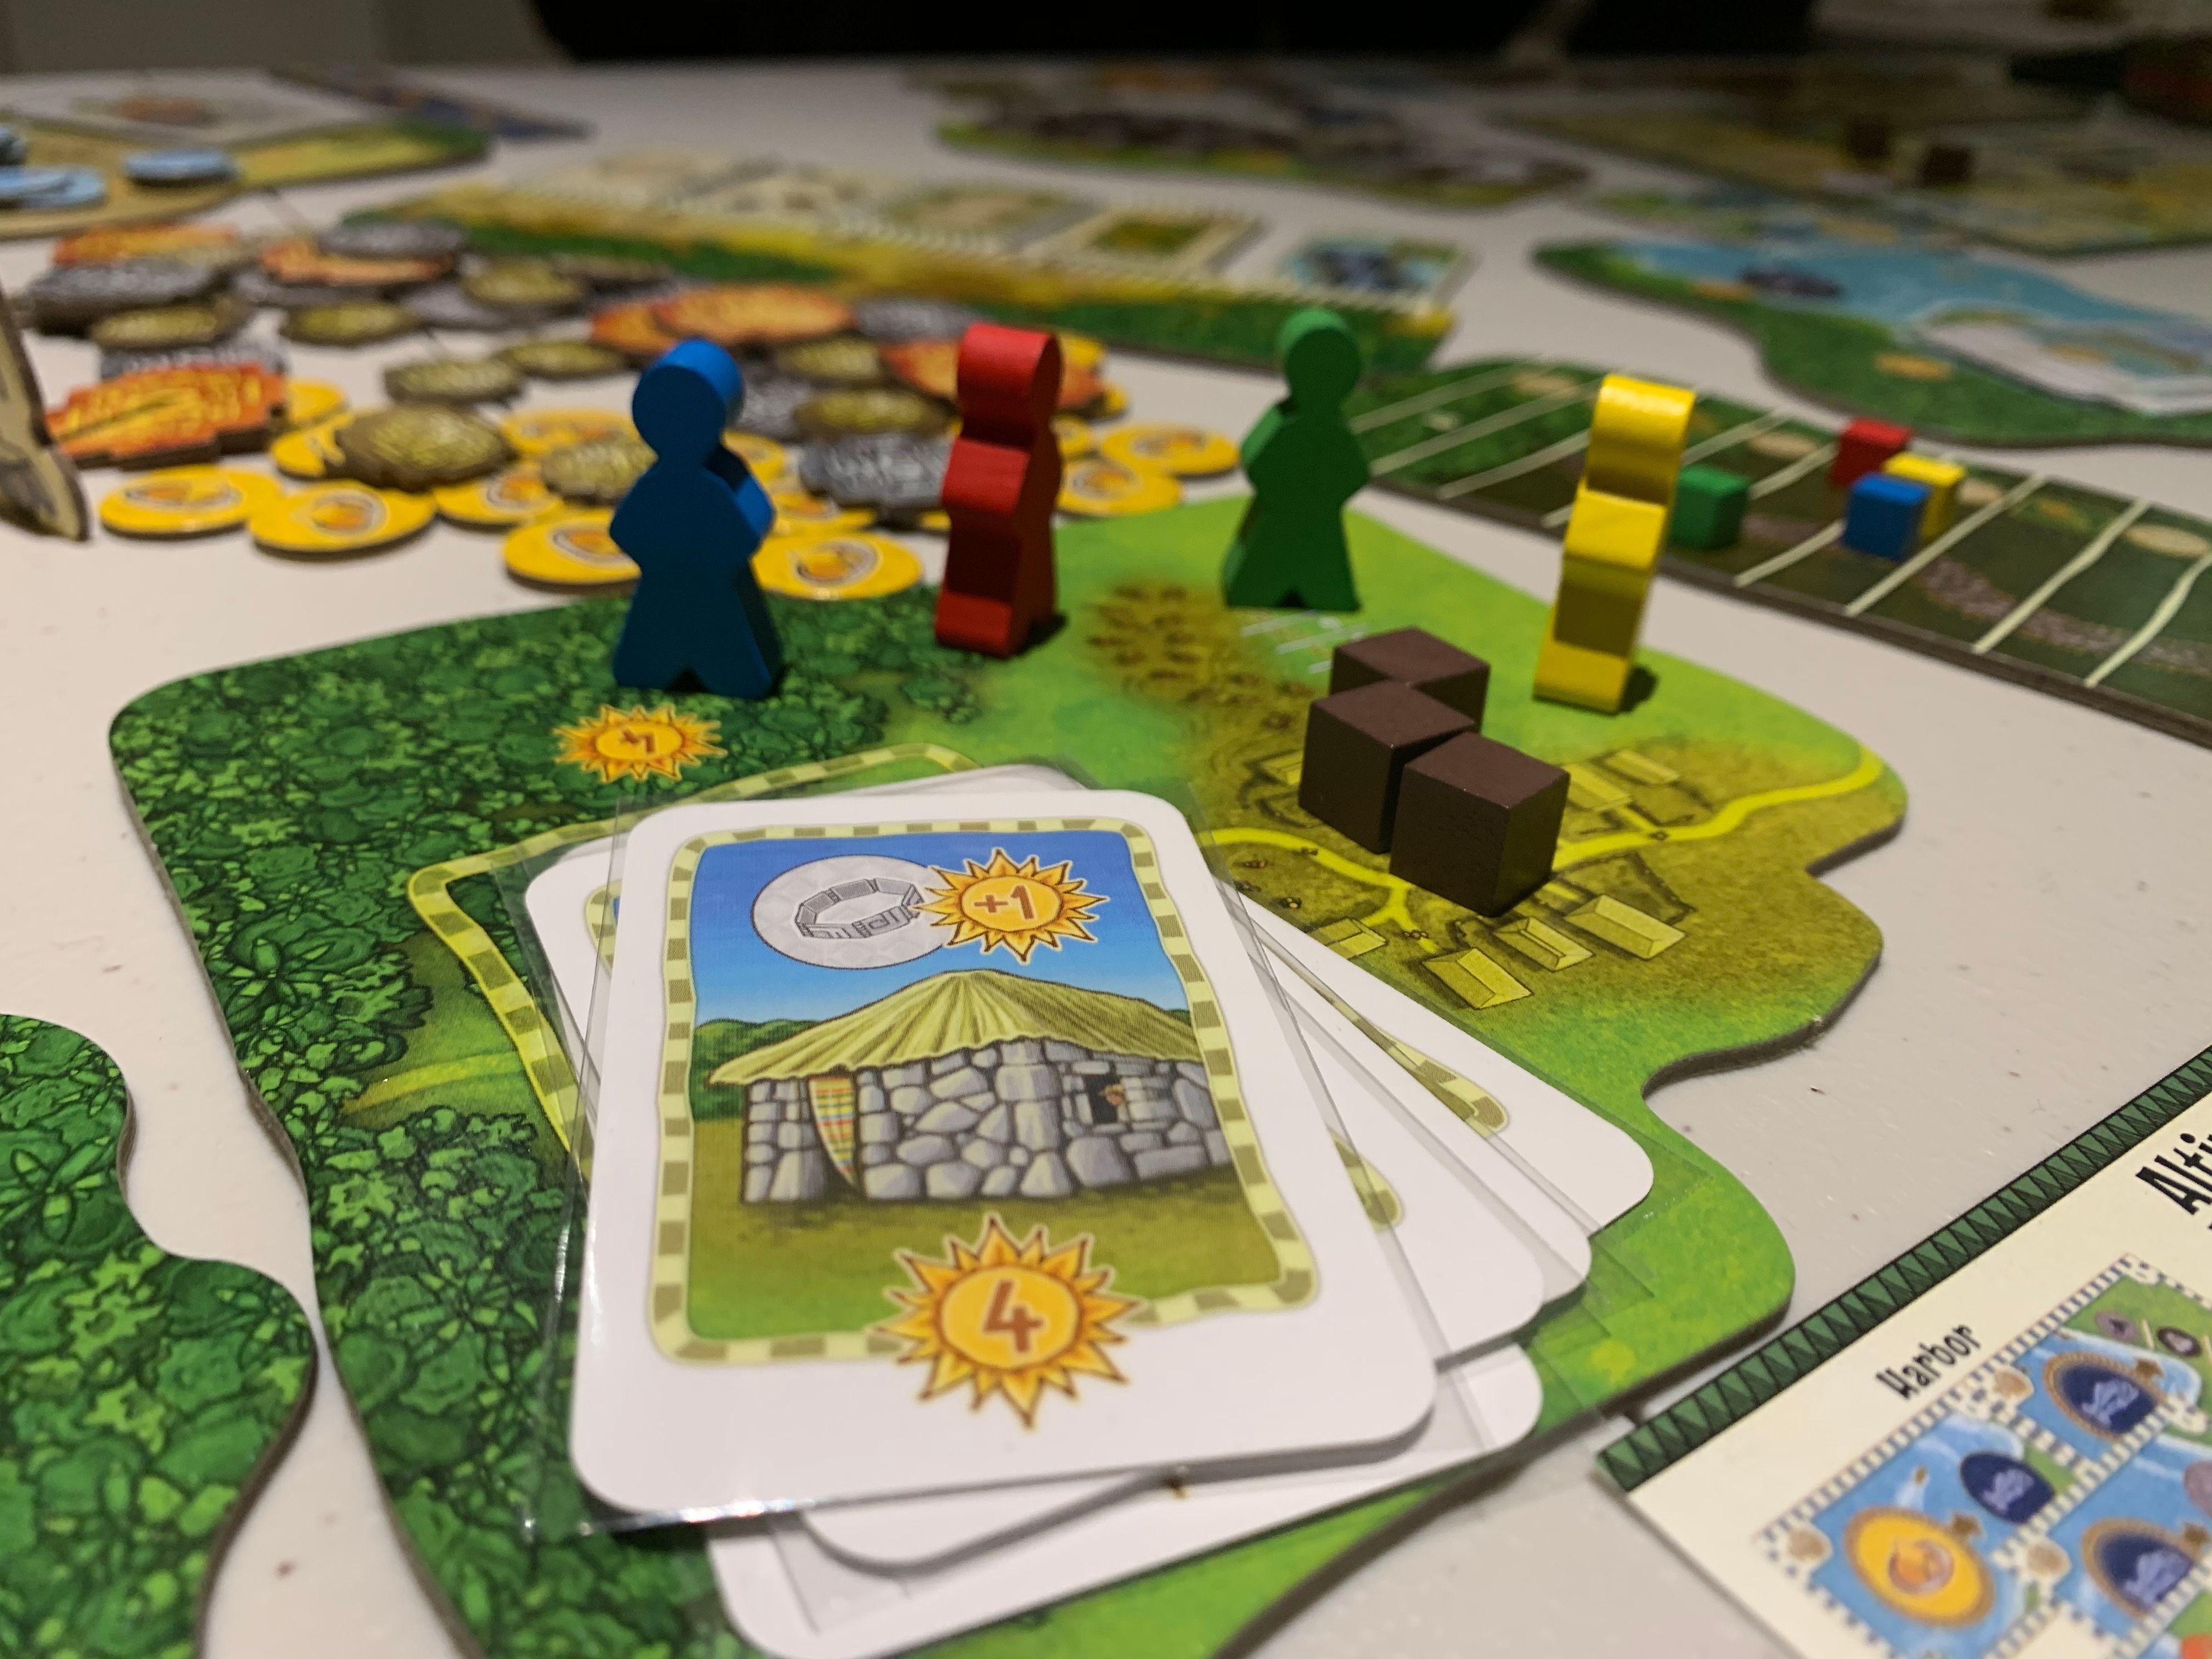 Sydney Tabletop Games - Sydney's Premium Board Game Group